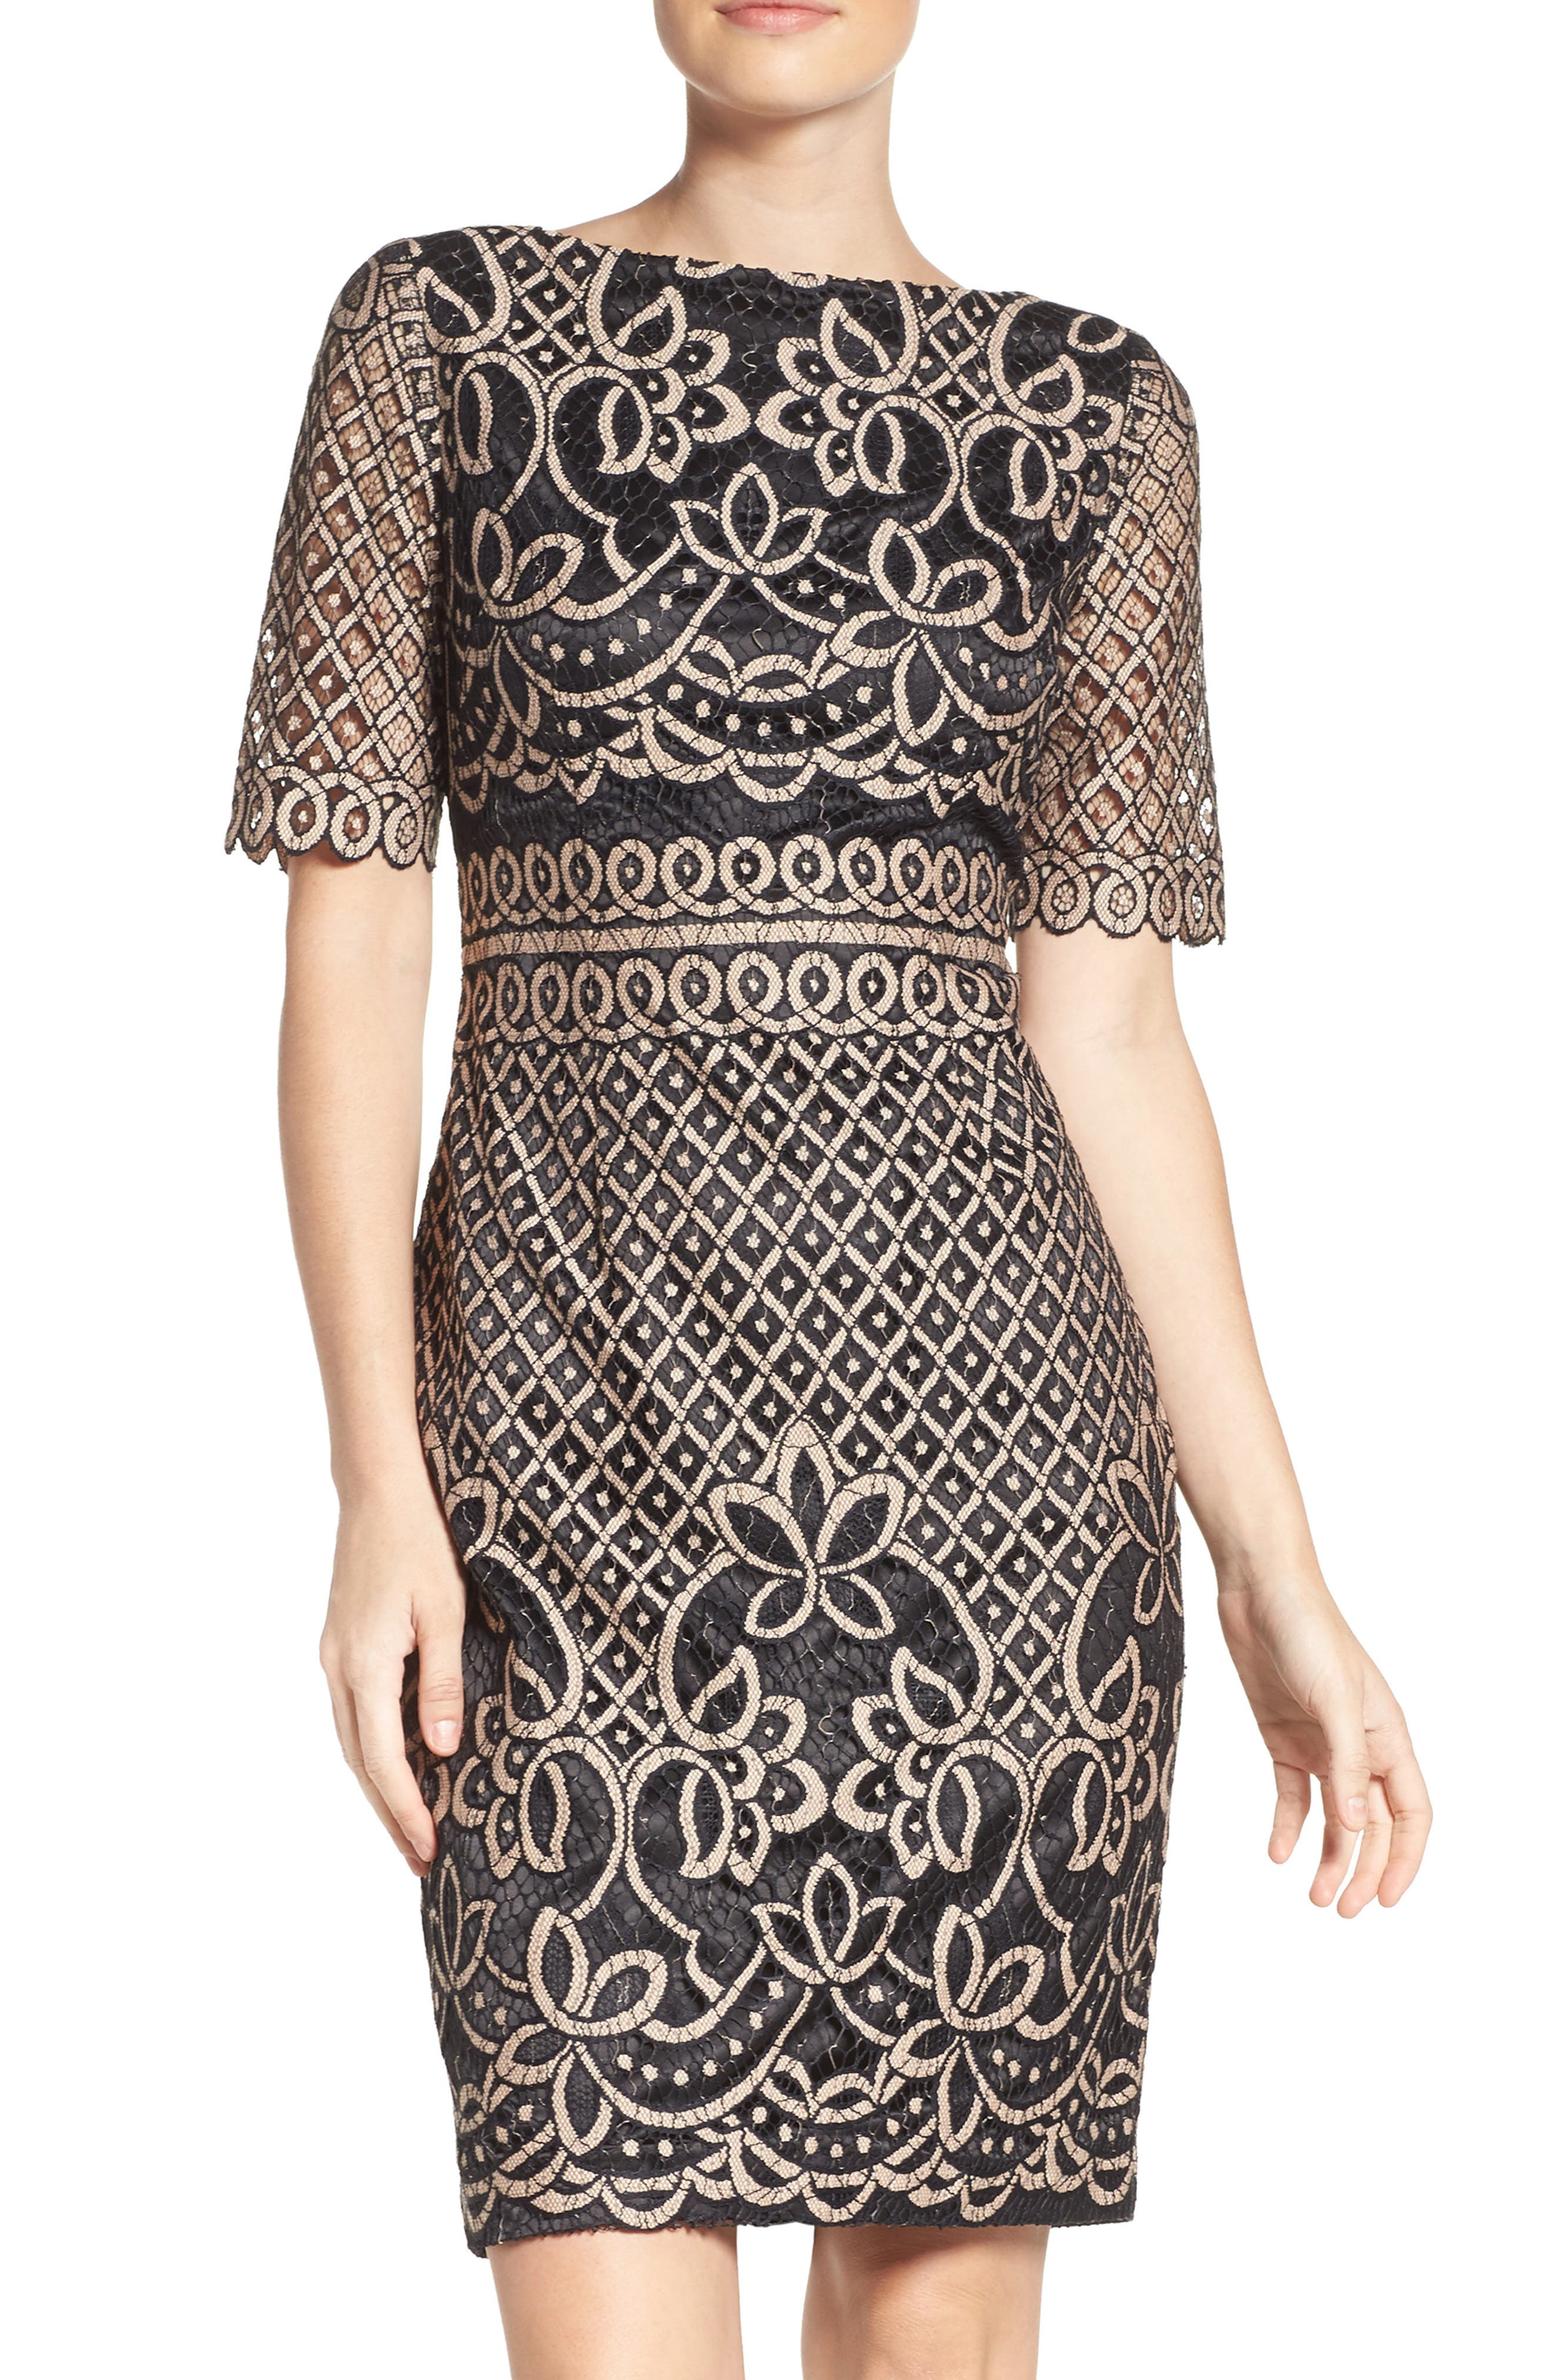 ELIZA J, Lace Sheath Dress, Main thumbnail 1, color, 009